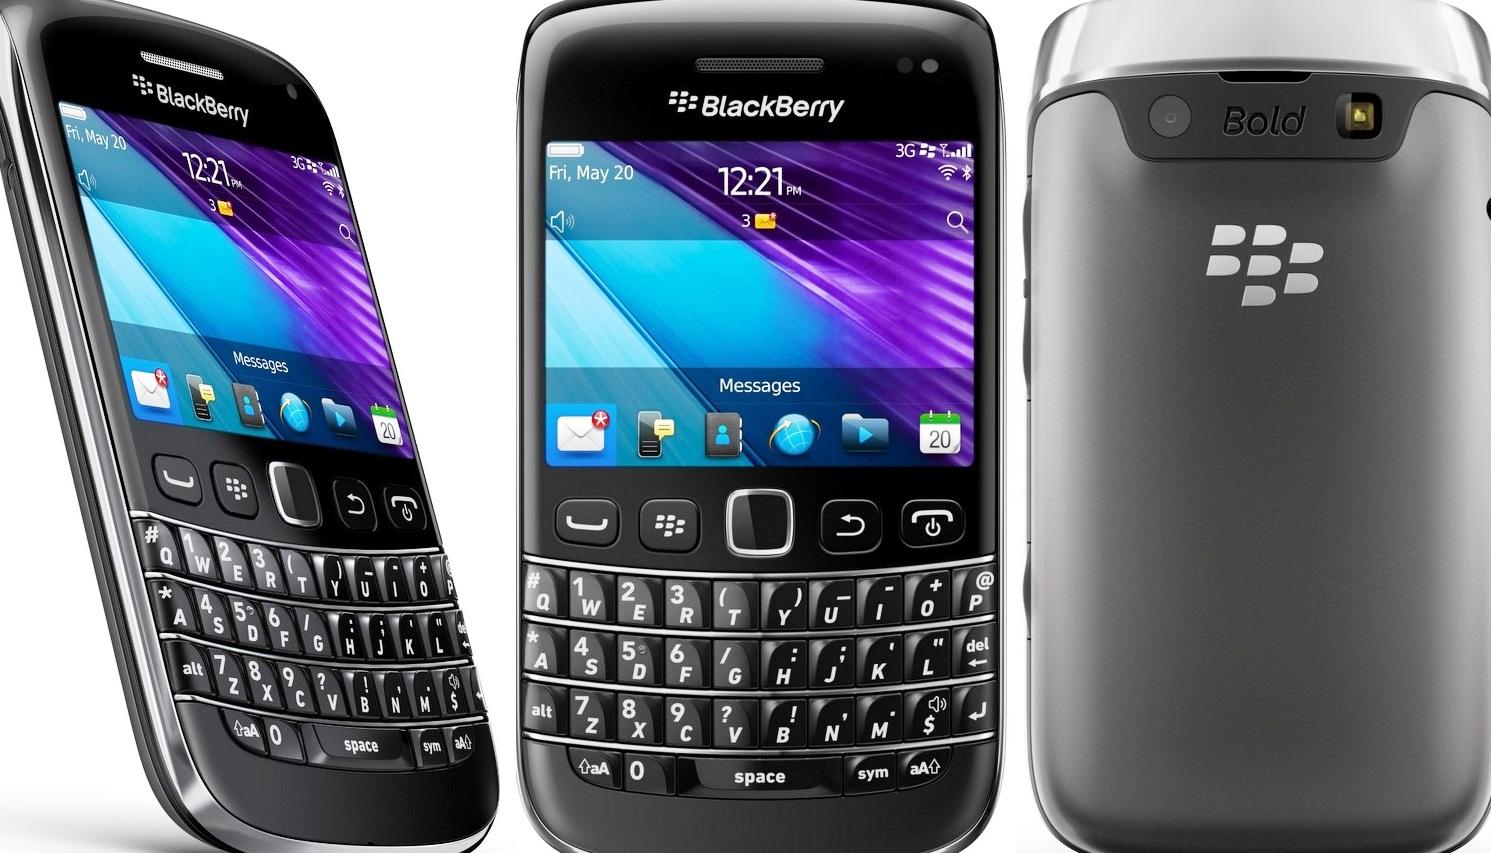 Harga BlackBerry Bold 9790 Bellagio Terbaru Akhir Januari 2014